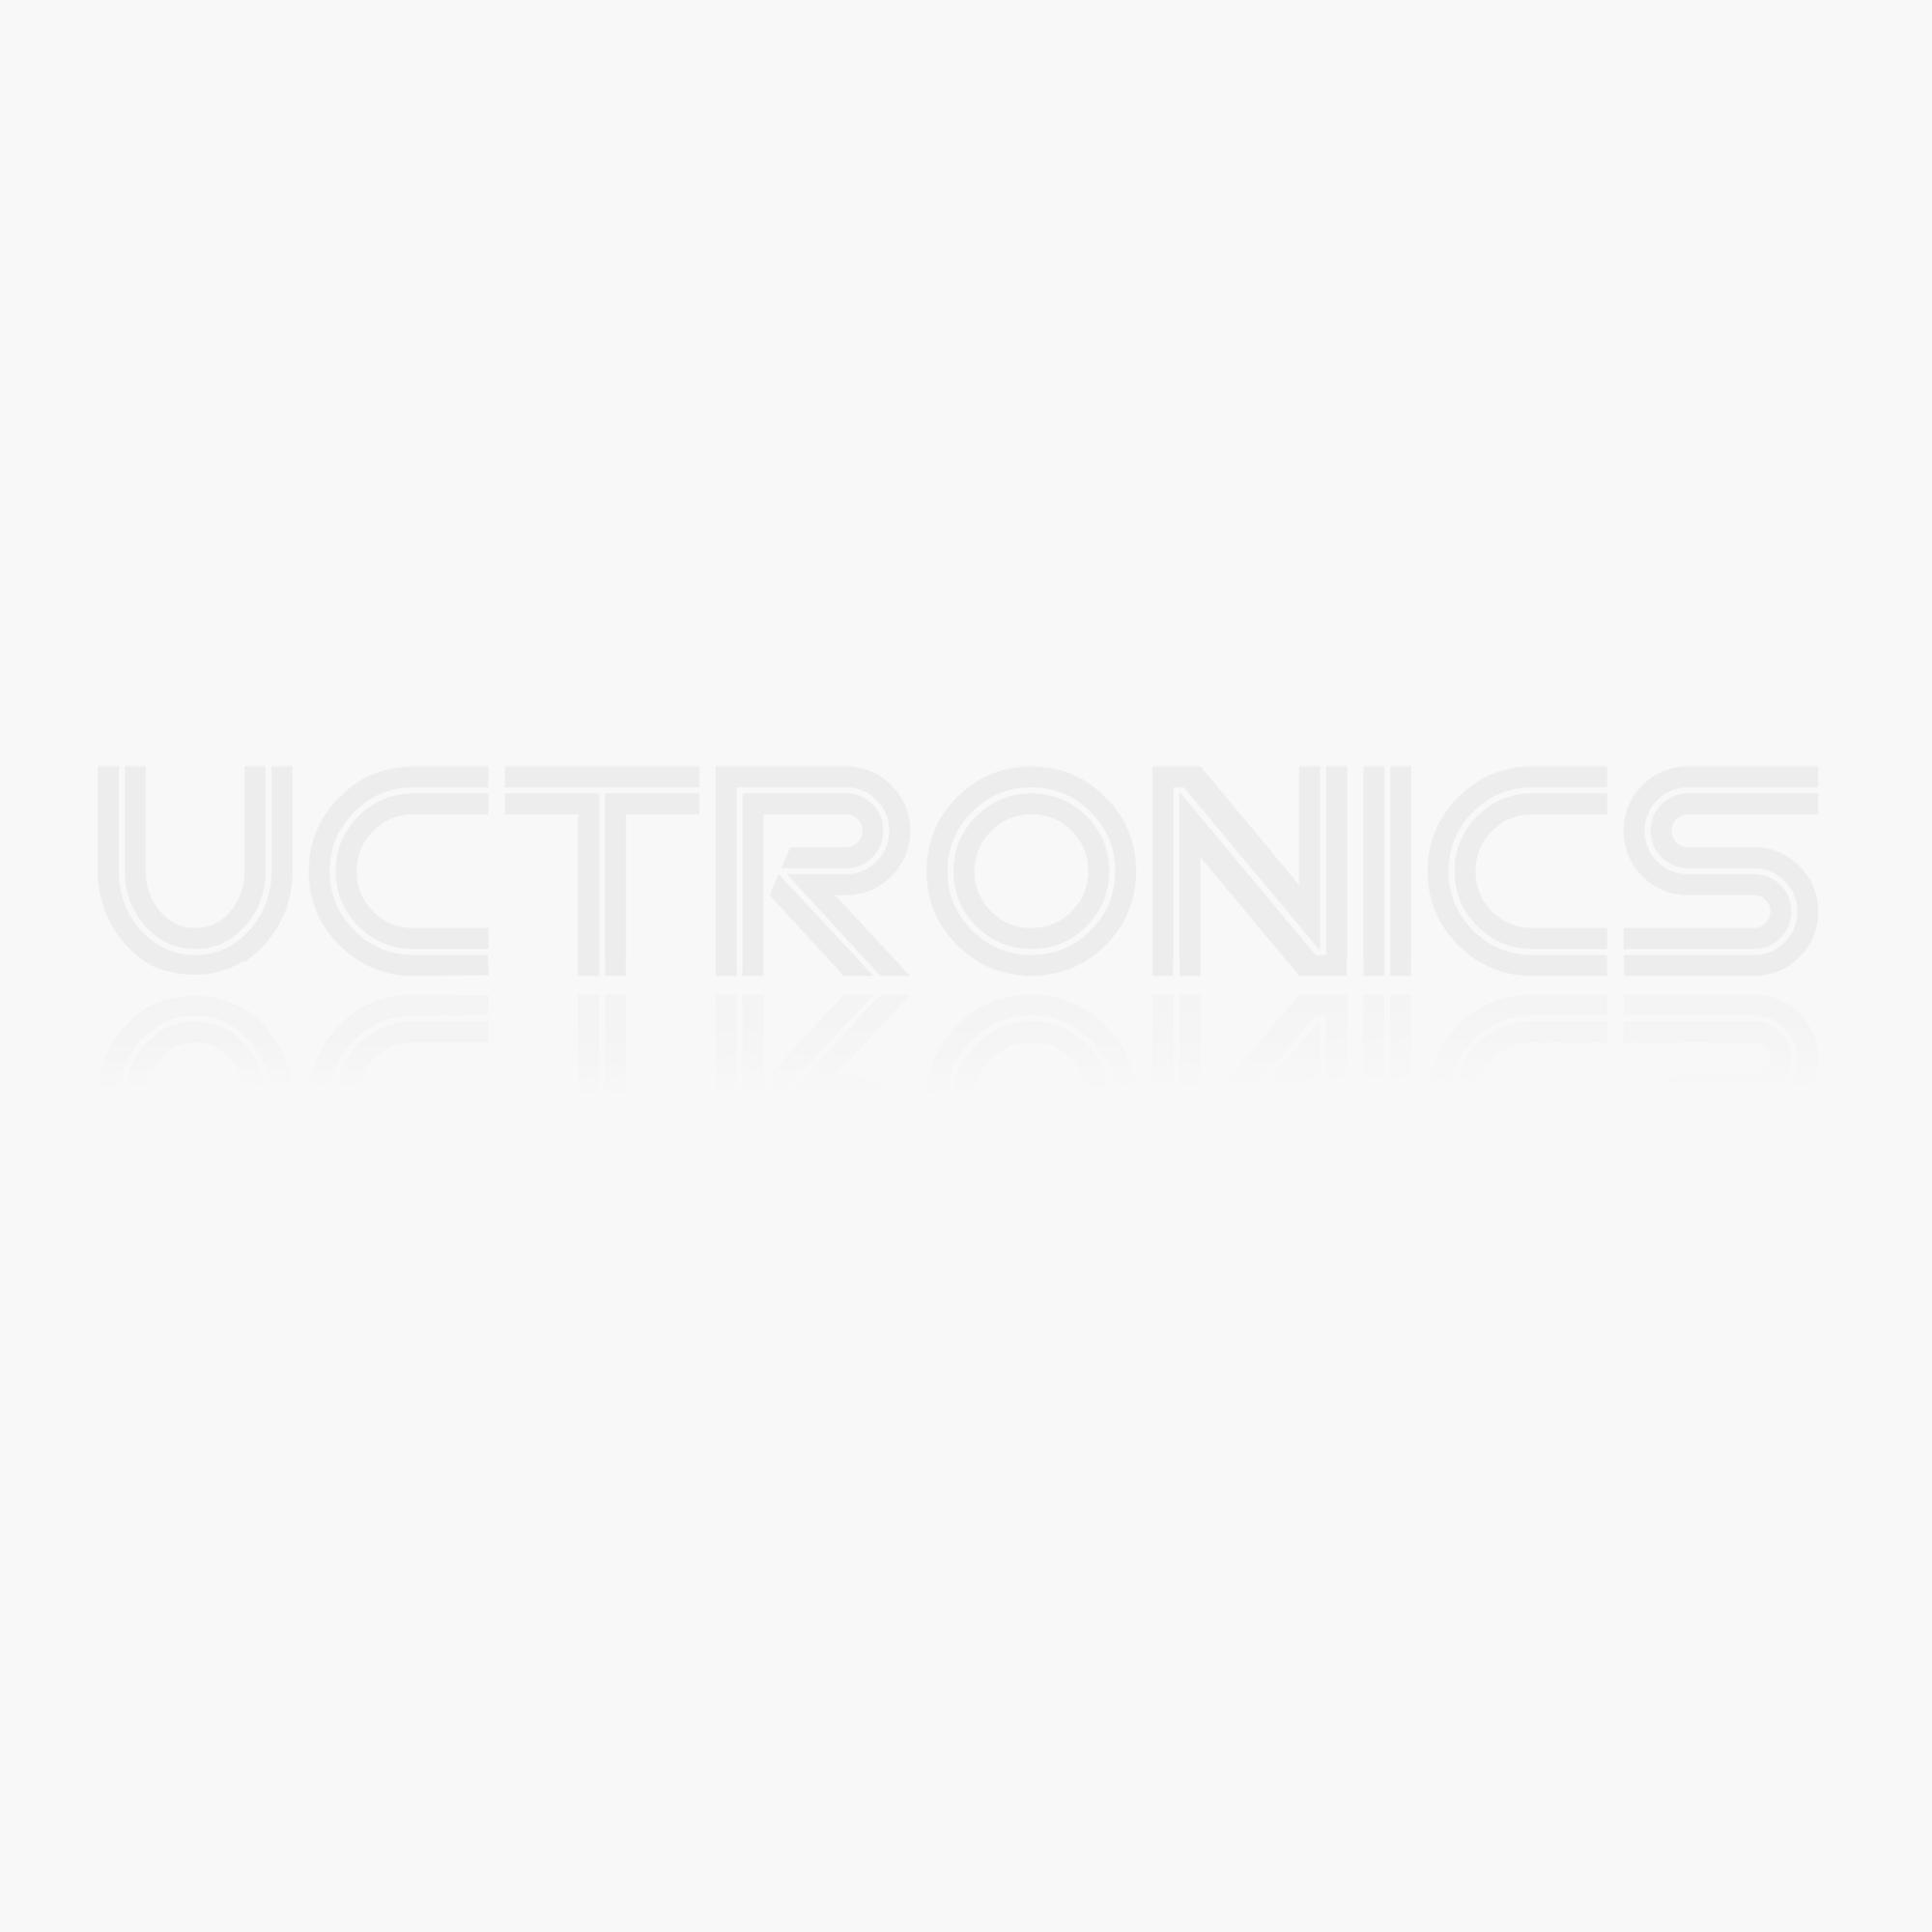 4 Channel Bi-directional 3.3V to 5V Logic Level Converter Module for Arduino